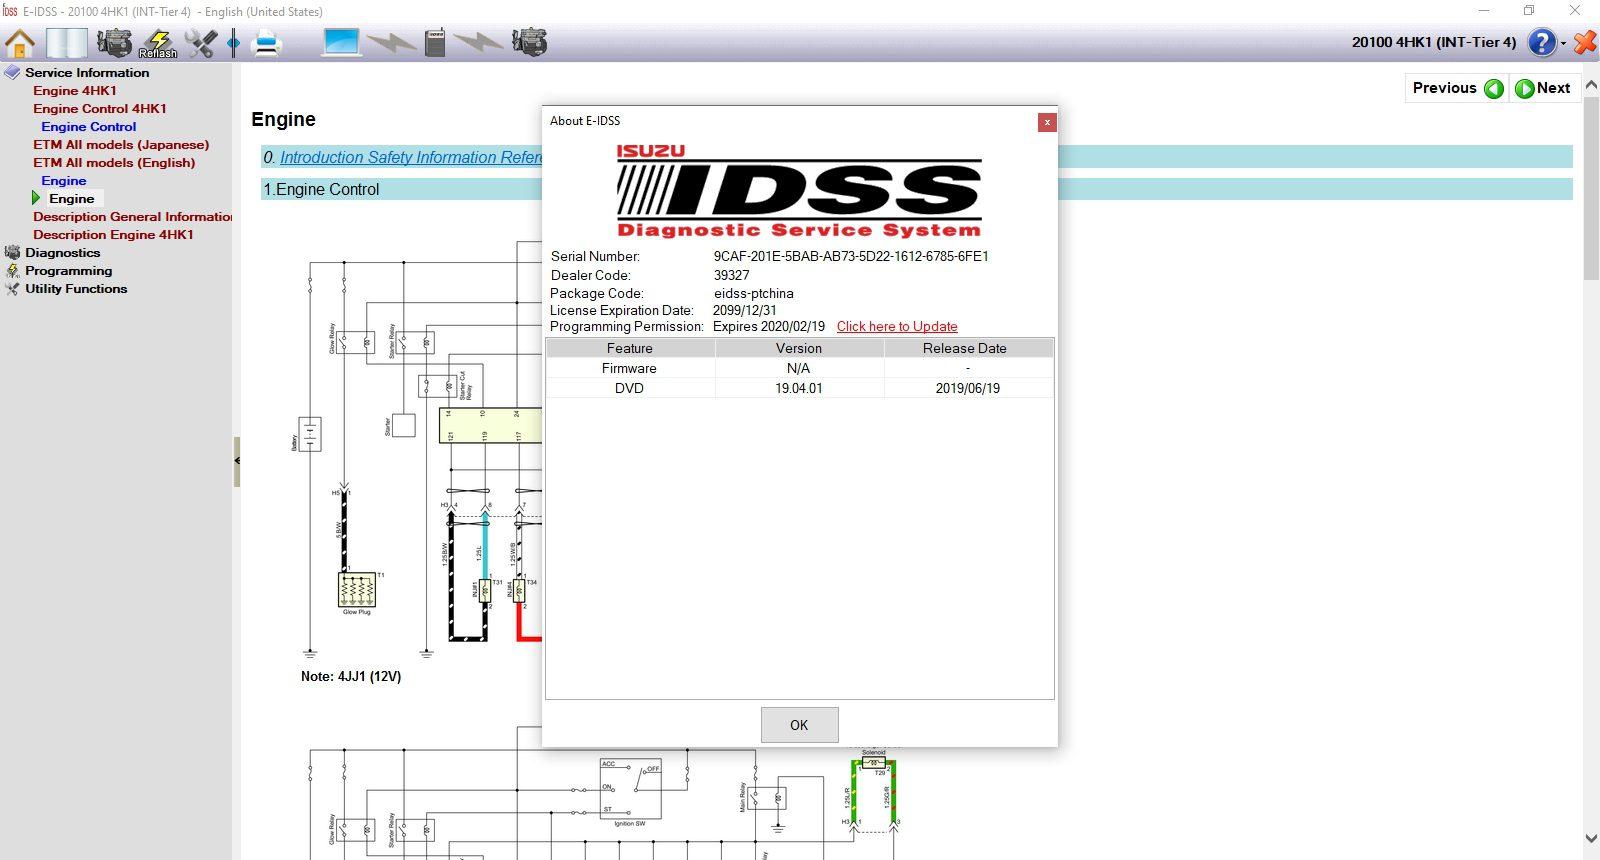 Isuzu_IDSS_Release_2019_Diagnostic_Service_System_20